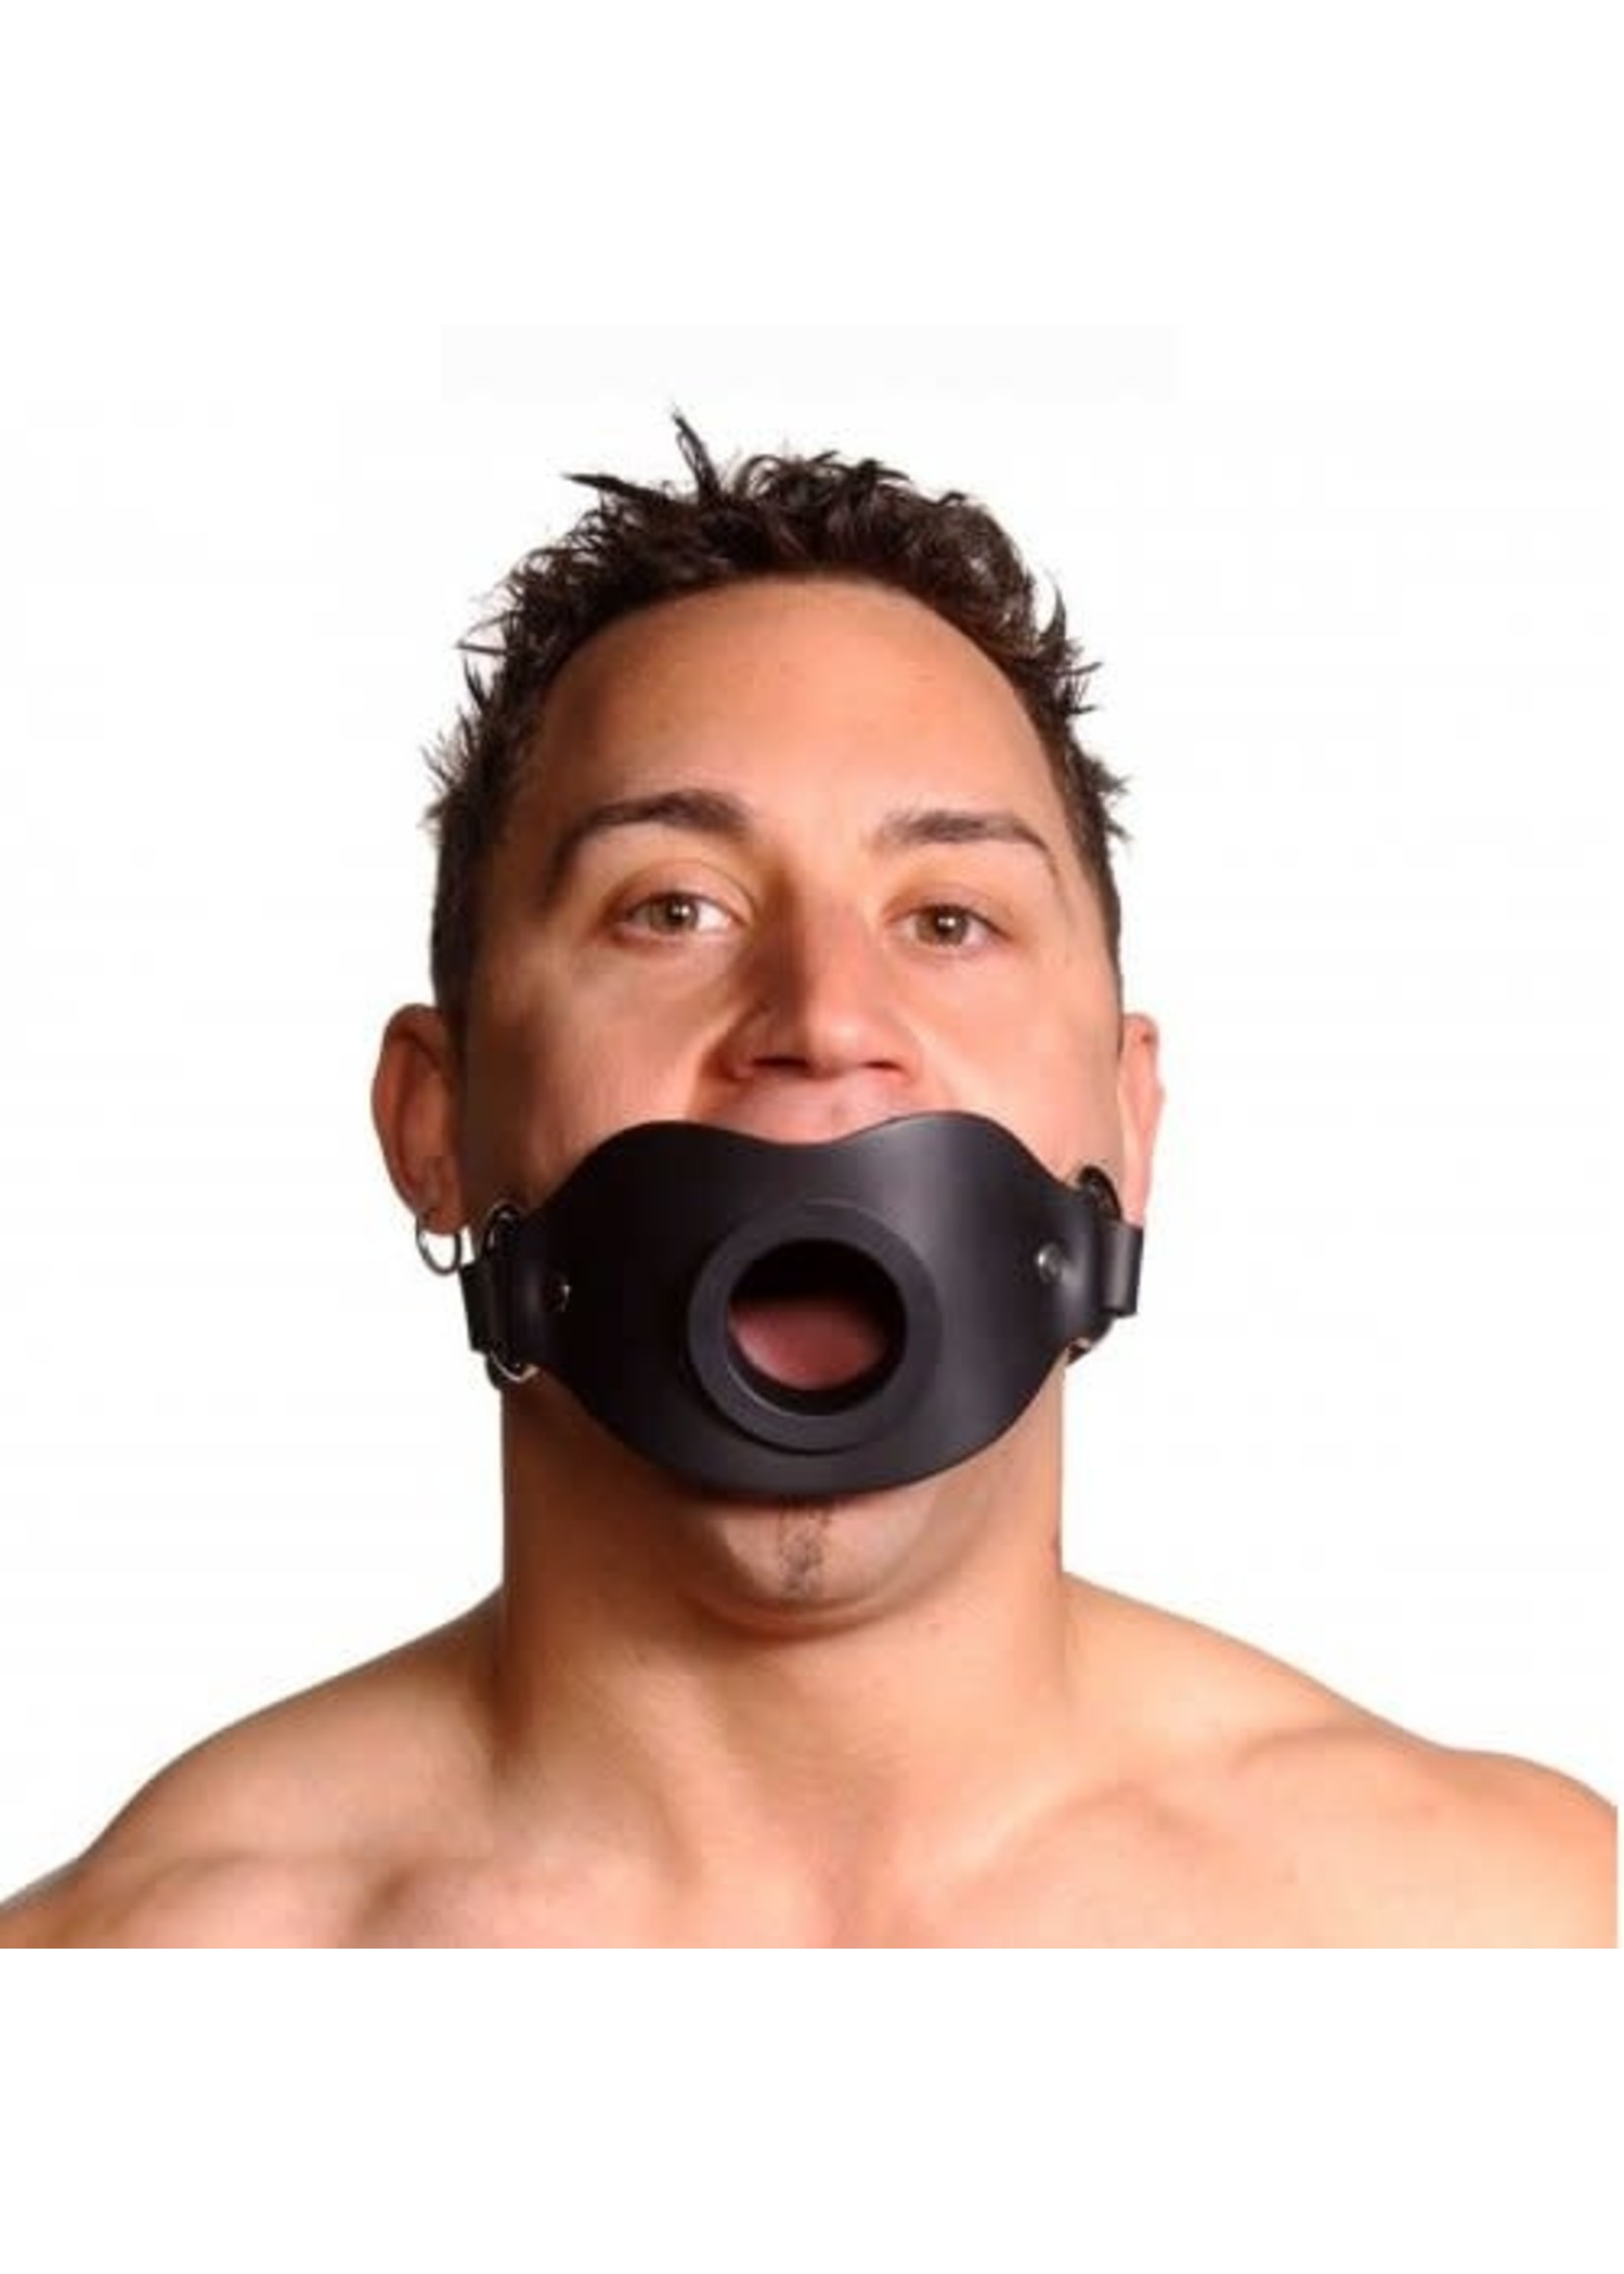 Master Series Master Series Feeder Open Mouth Gag